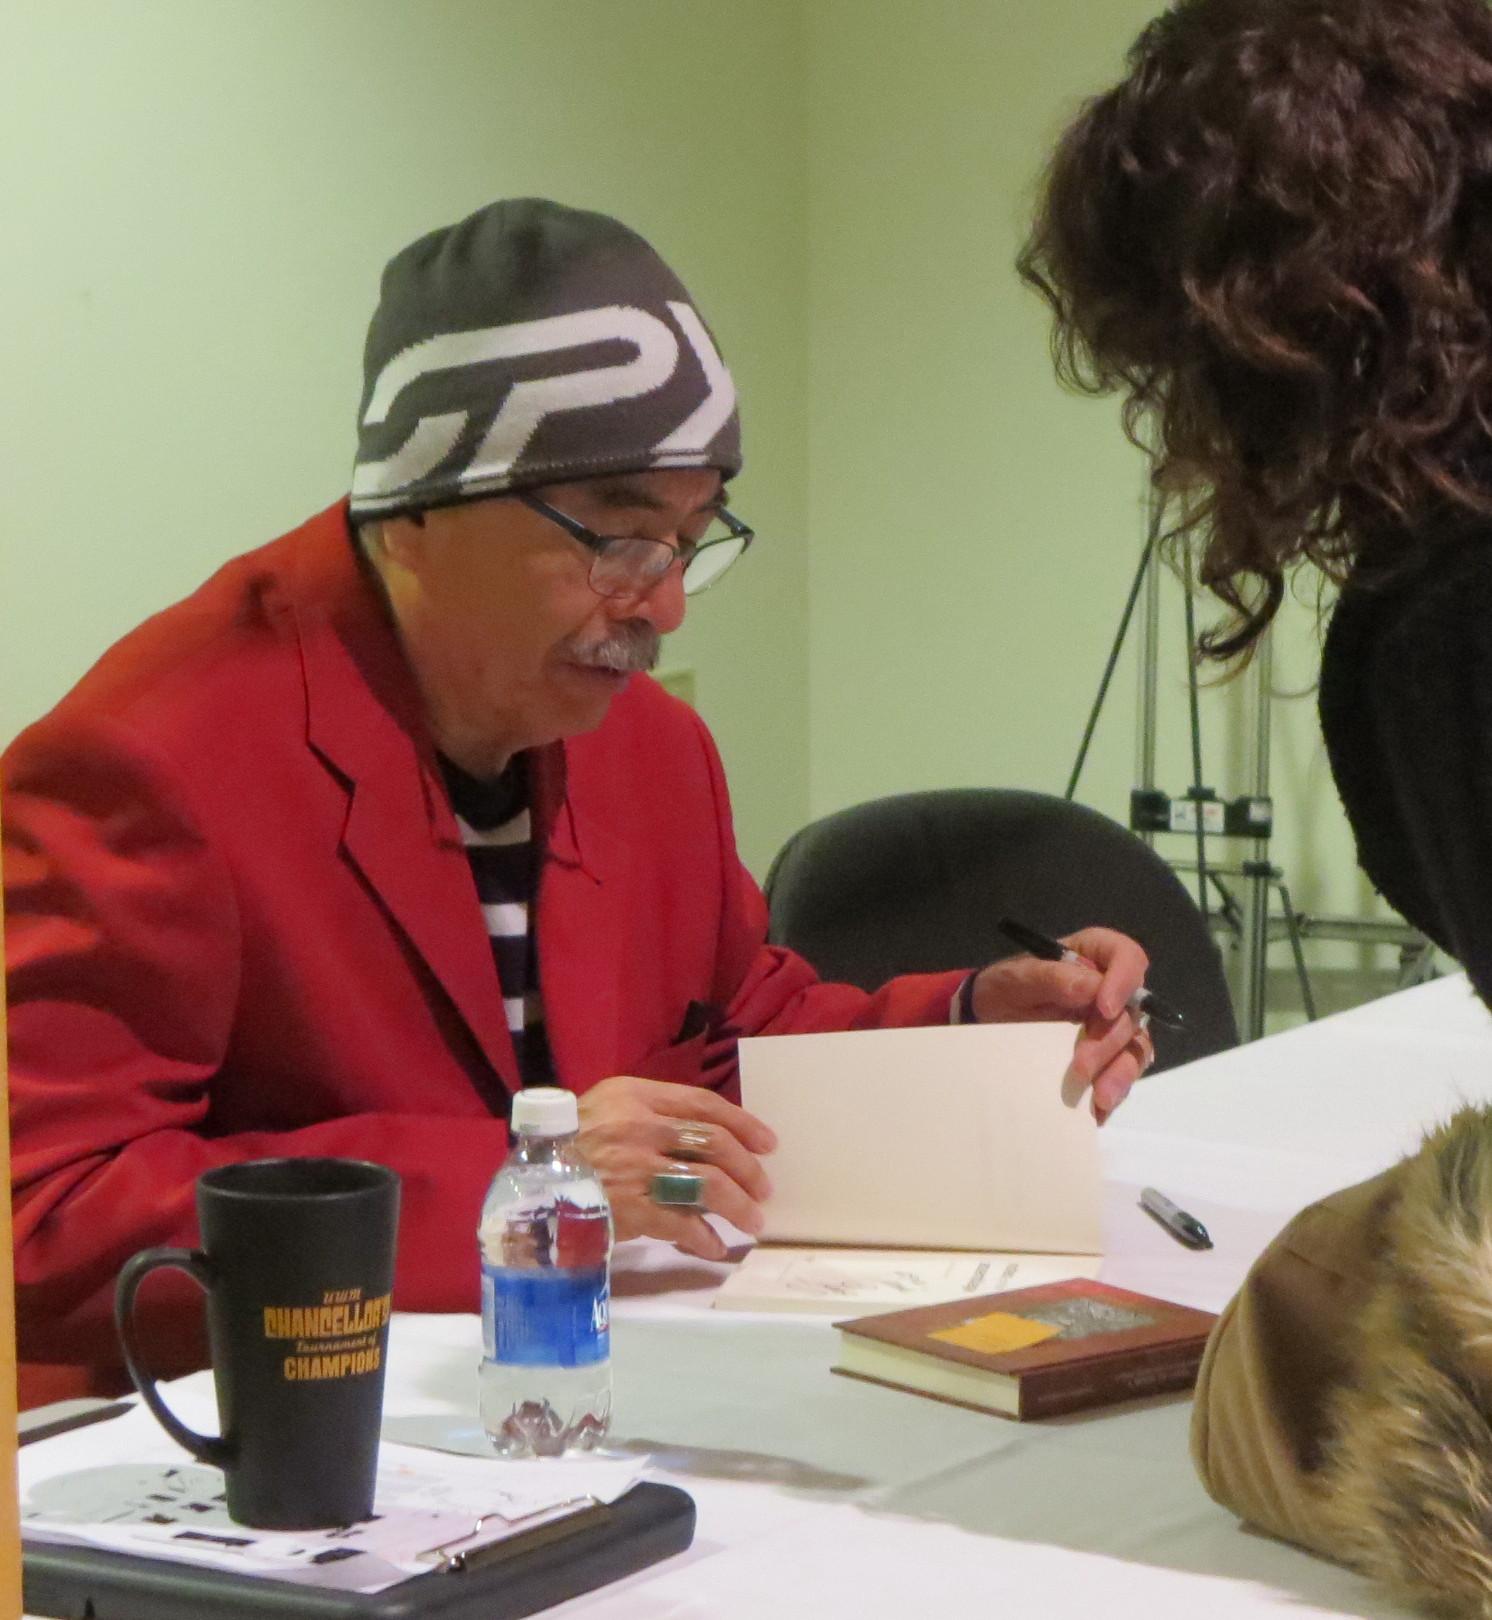 Juan Felipe Herrera, current Poet Laureate of the United States, signing book in Wisconsin.